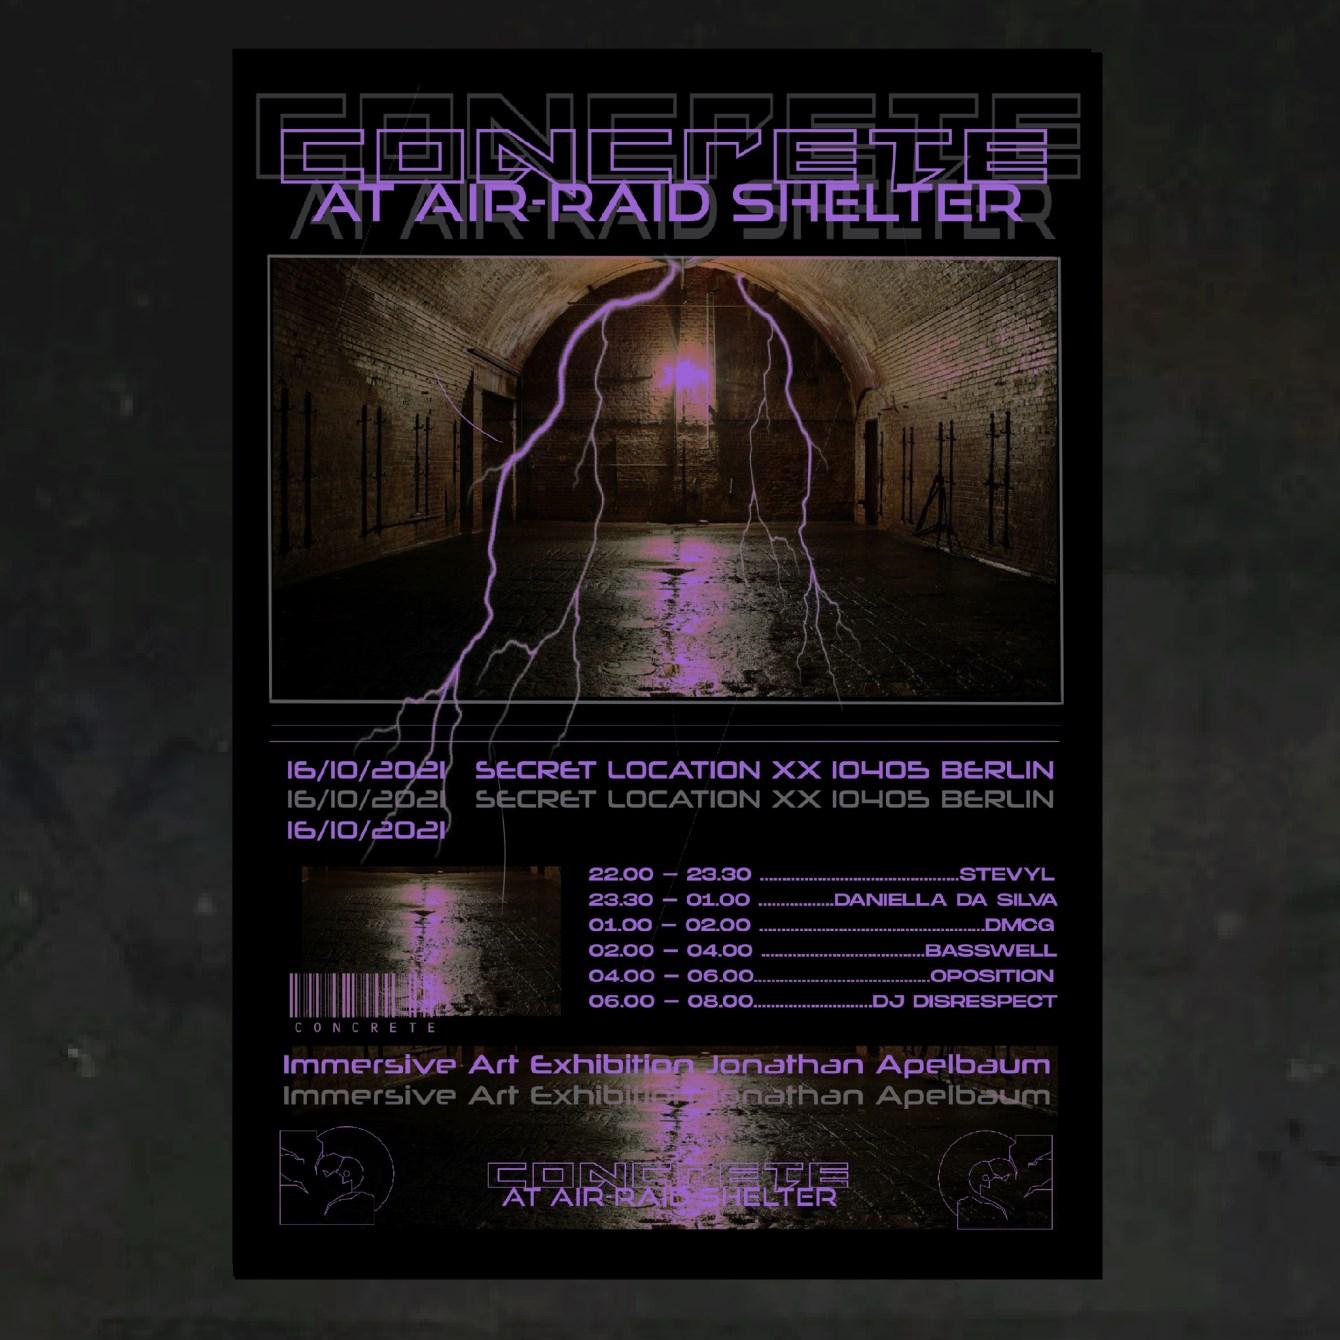 Concrete at Air-Raid Shelter - Flyer front